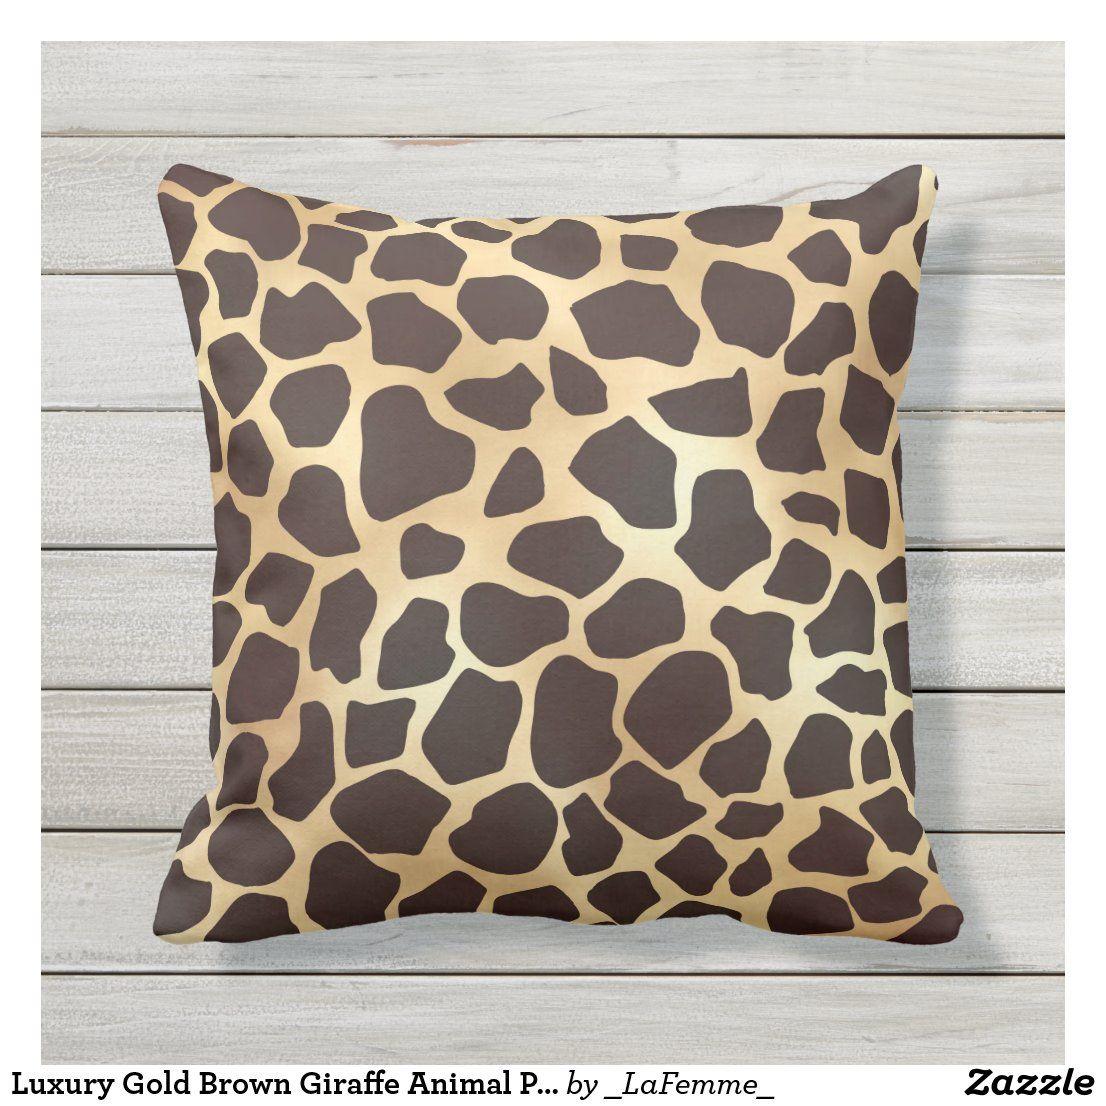 Luxury Gold Brown Giraffe Animal Print Pattern Outdoor Pillow In 2020 Animal Prints Pattern Outdoor Pillows Print Patterns